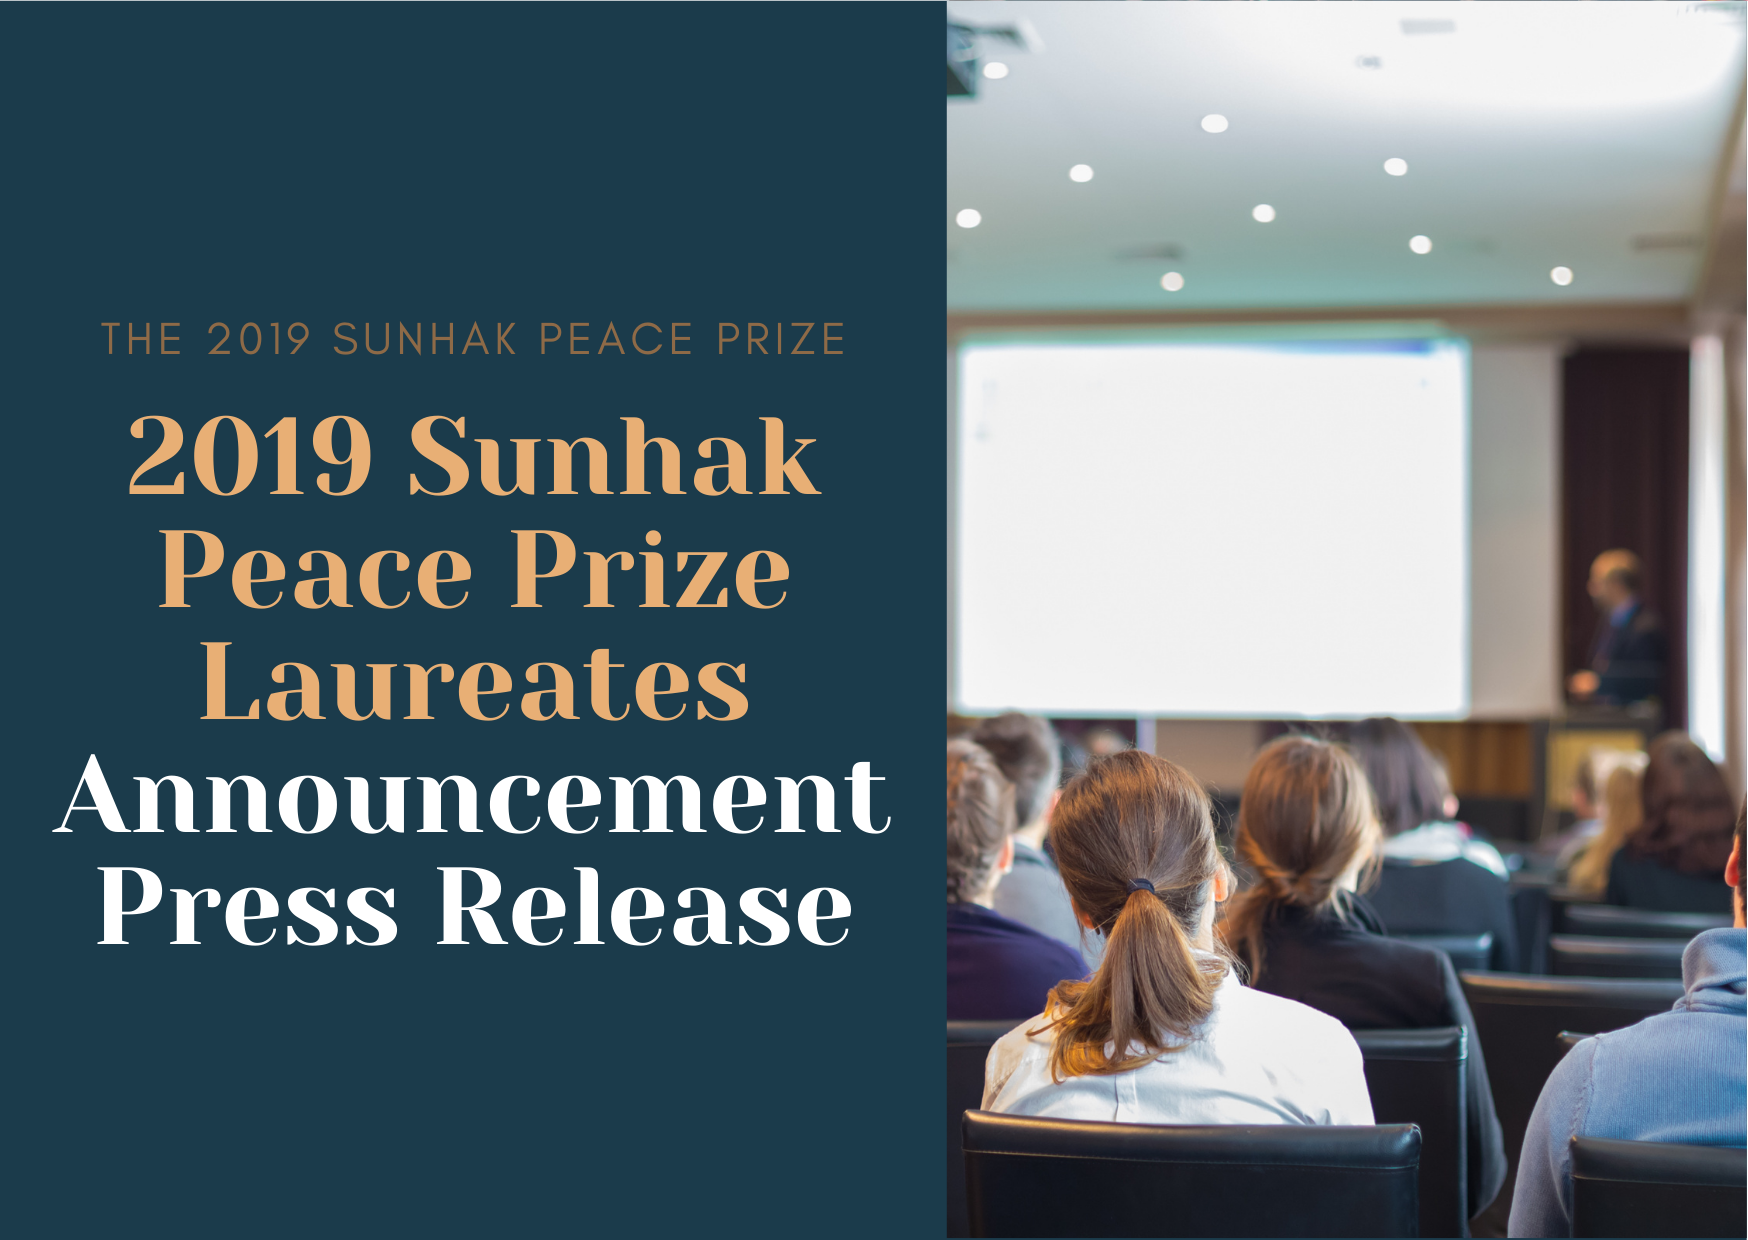 The 2019 Sunhak Peace Prize Awarded to Waris Dirie and Dr. Akinwumi Ayodeji Adesina 썸네일